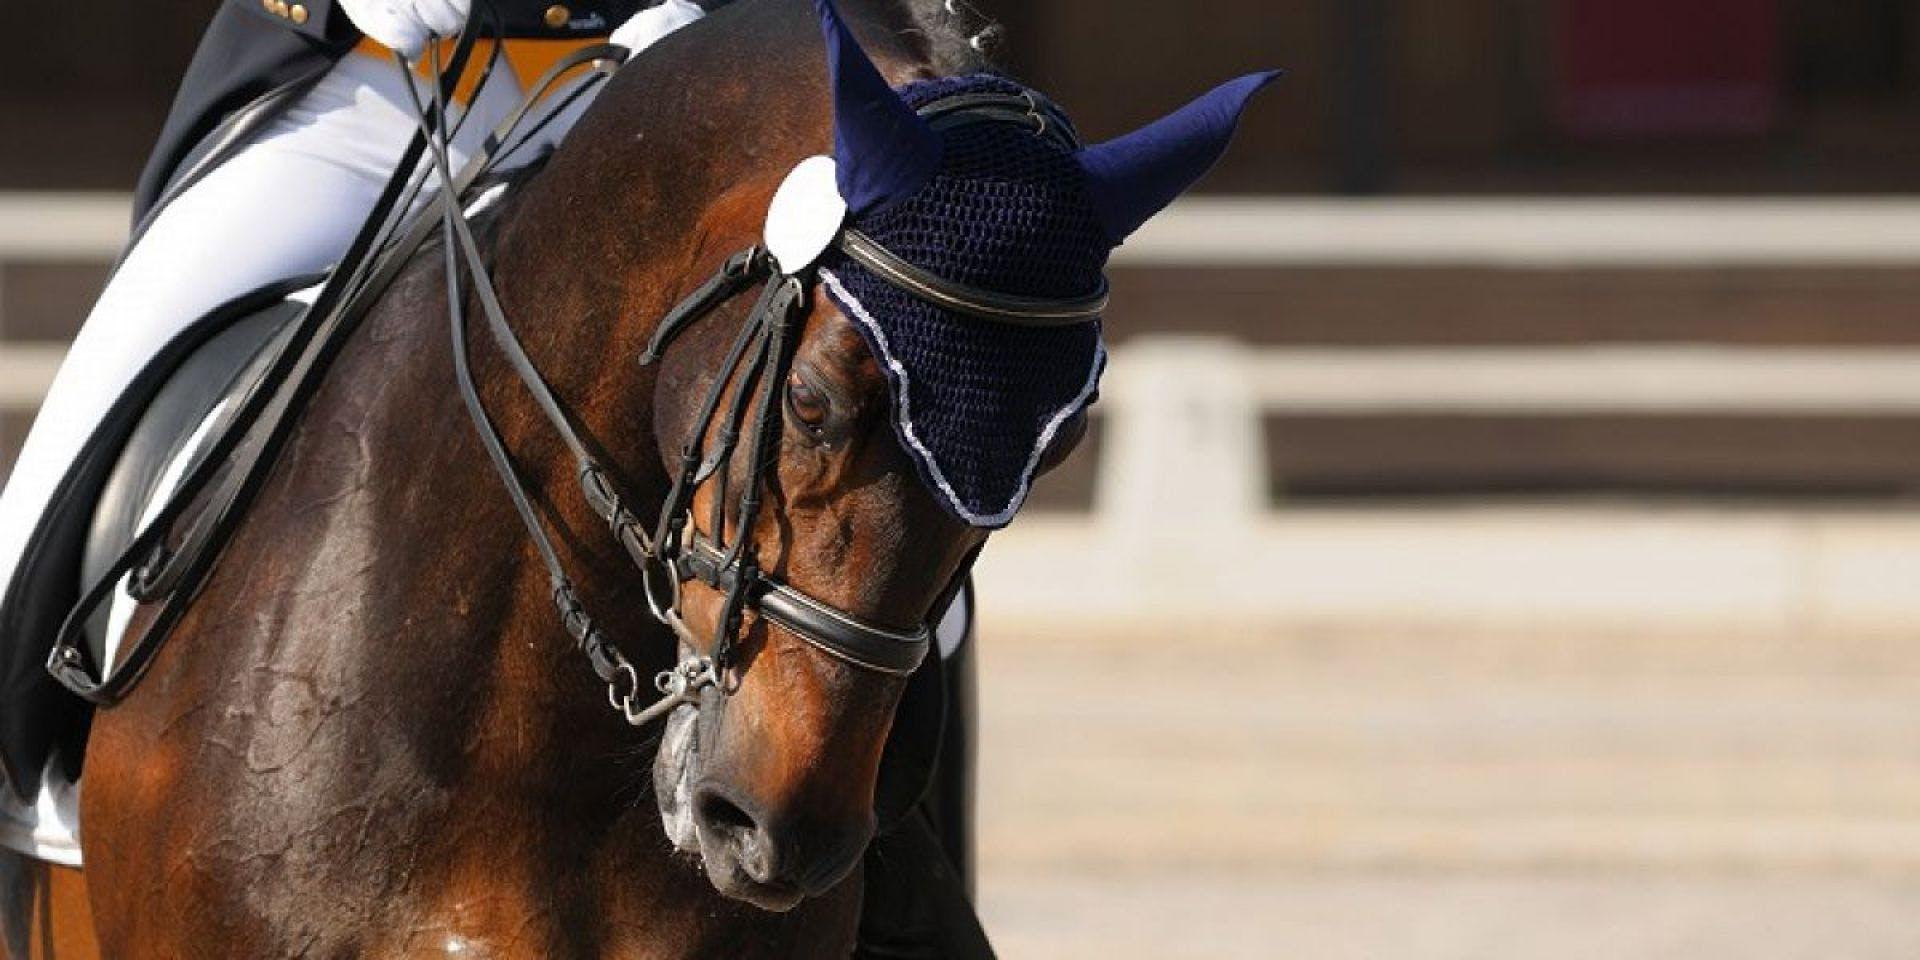 Cara Shardlow Dressage & Beckside Livery Stables